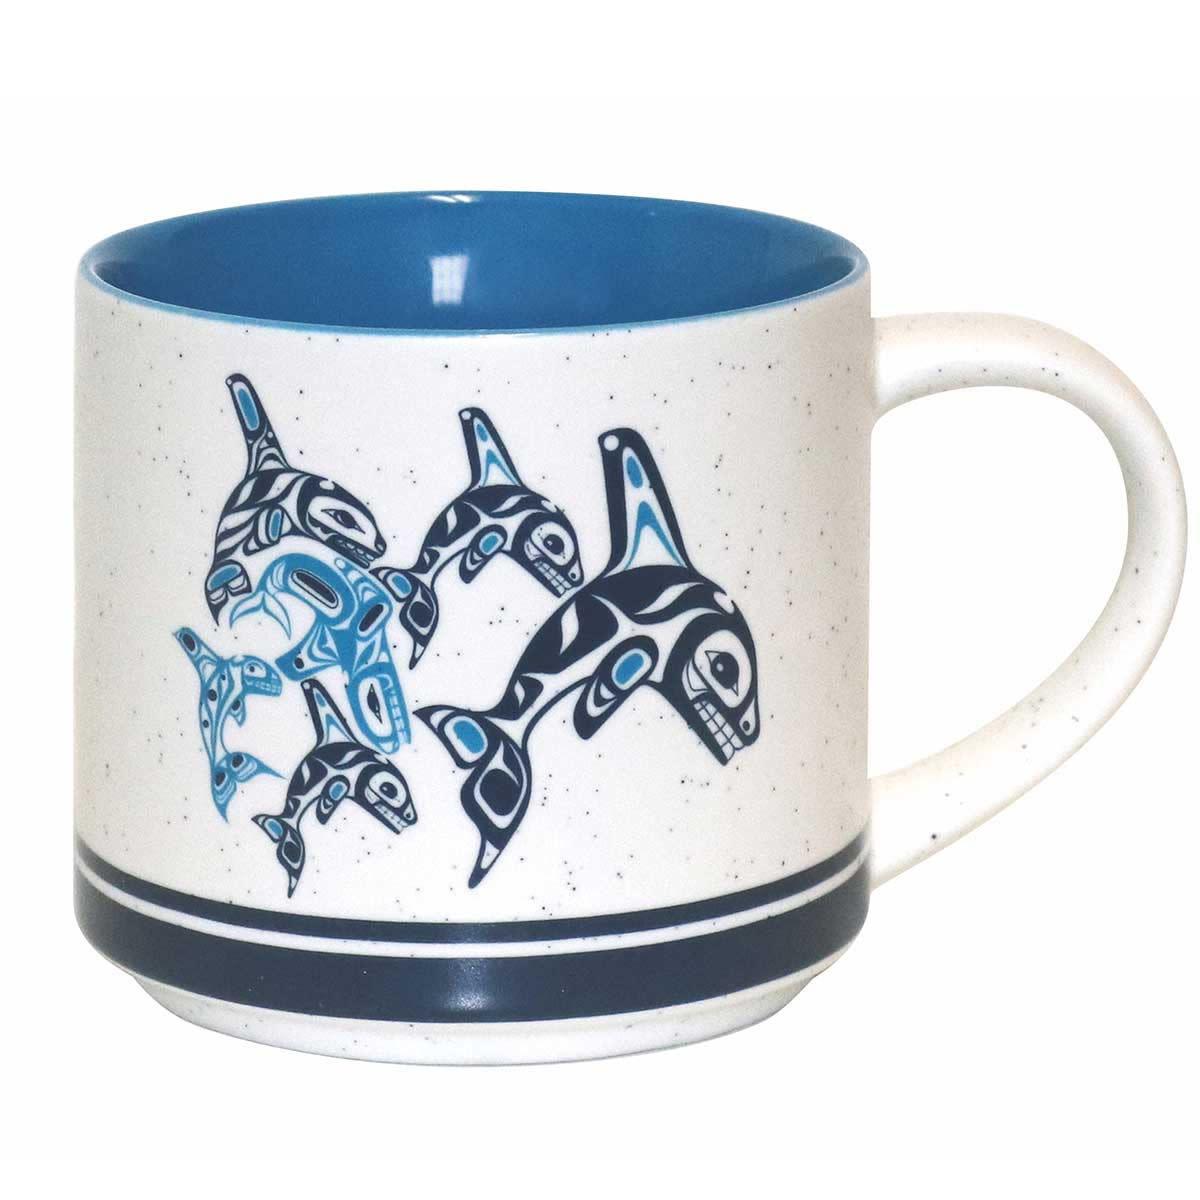 16 oz Ceramic Mug-7